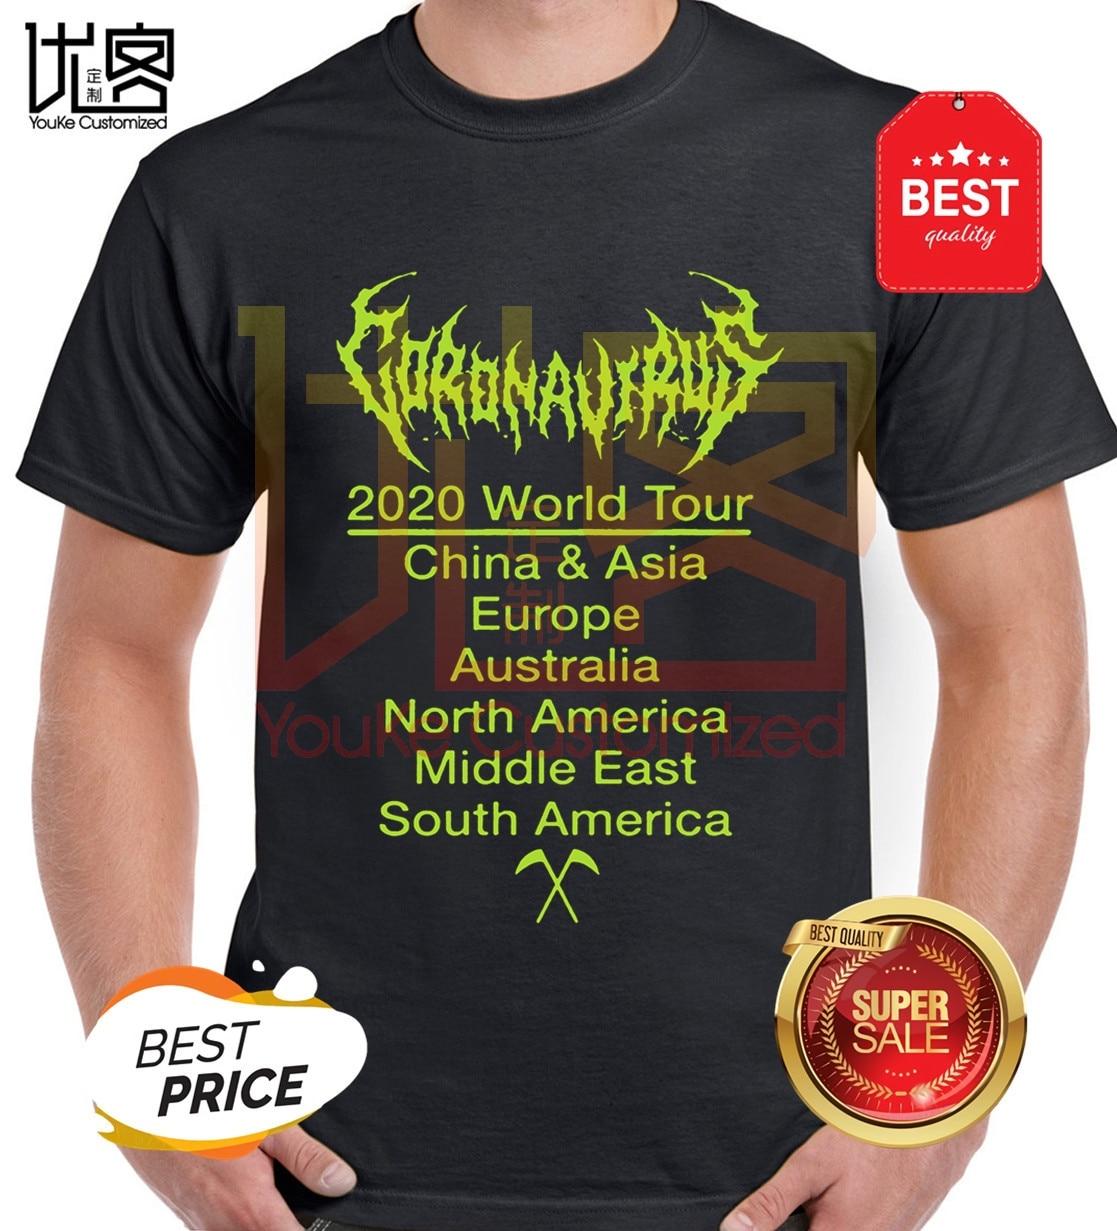 Coronavirus-world-tour-china-asia-europe-t-shirts Men's Women's 100% Cotton Short Sleeves Tops Tee Printed Crewneck T-shirt